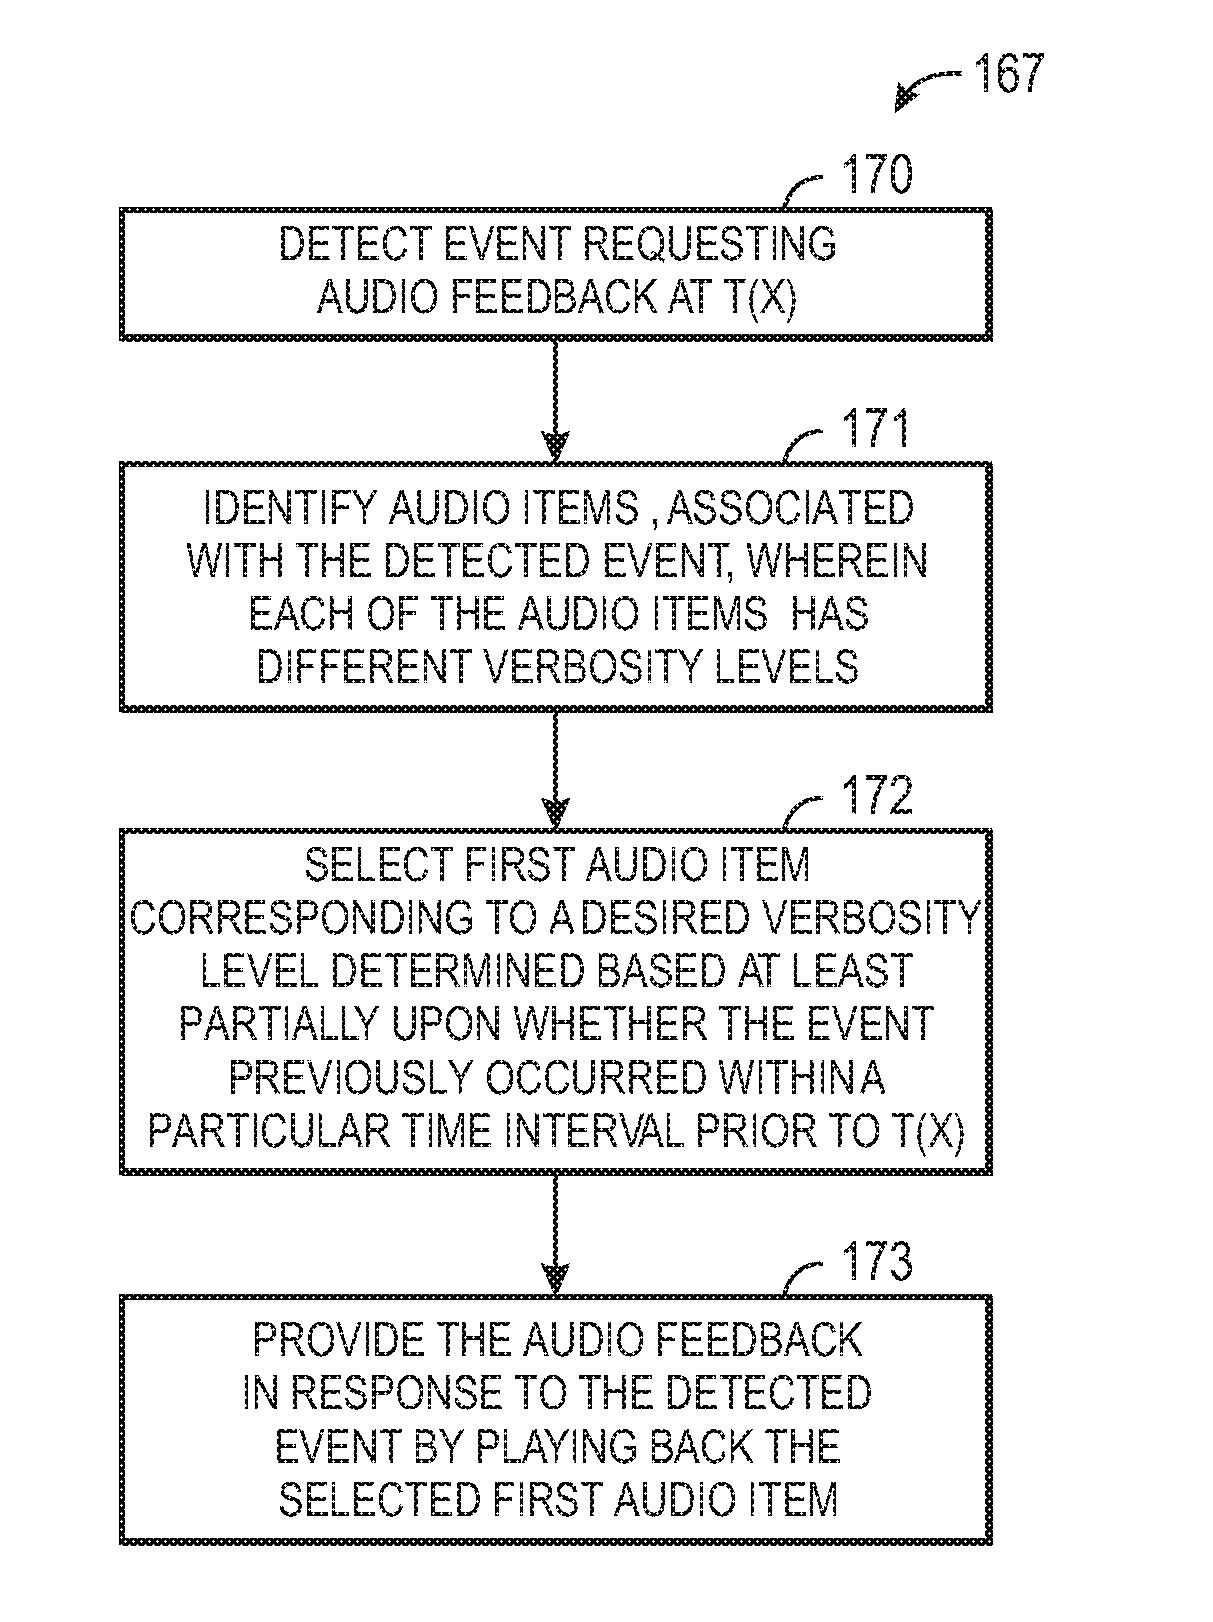 Patent US 9,311,043 B2